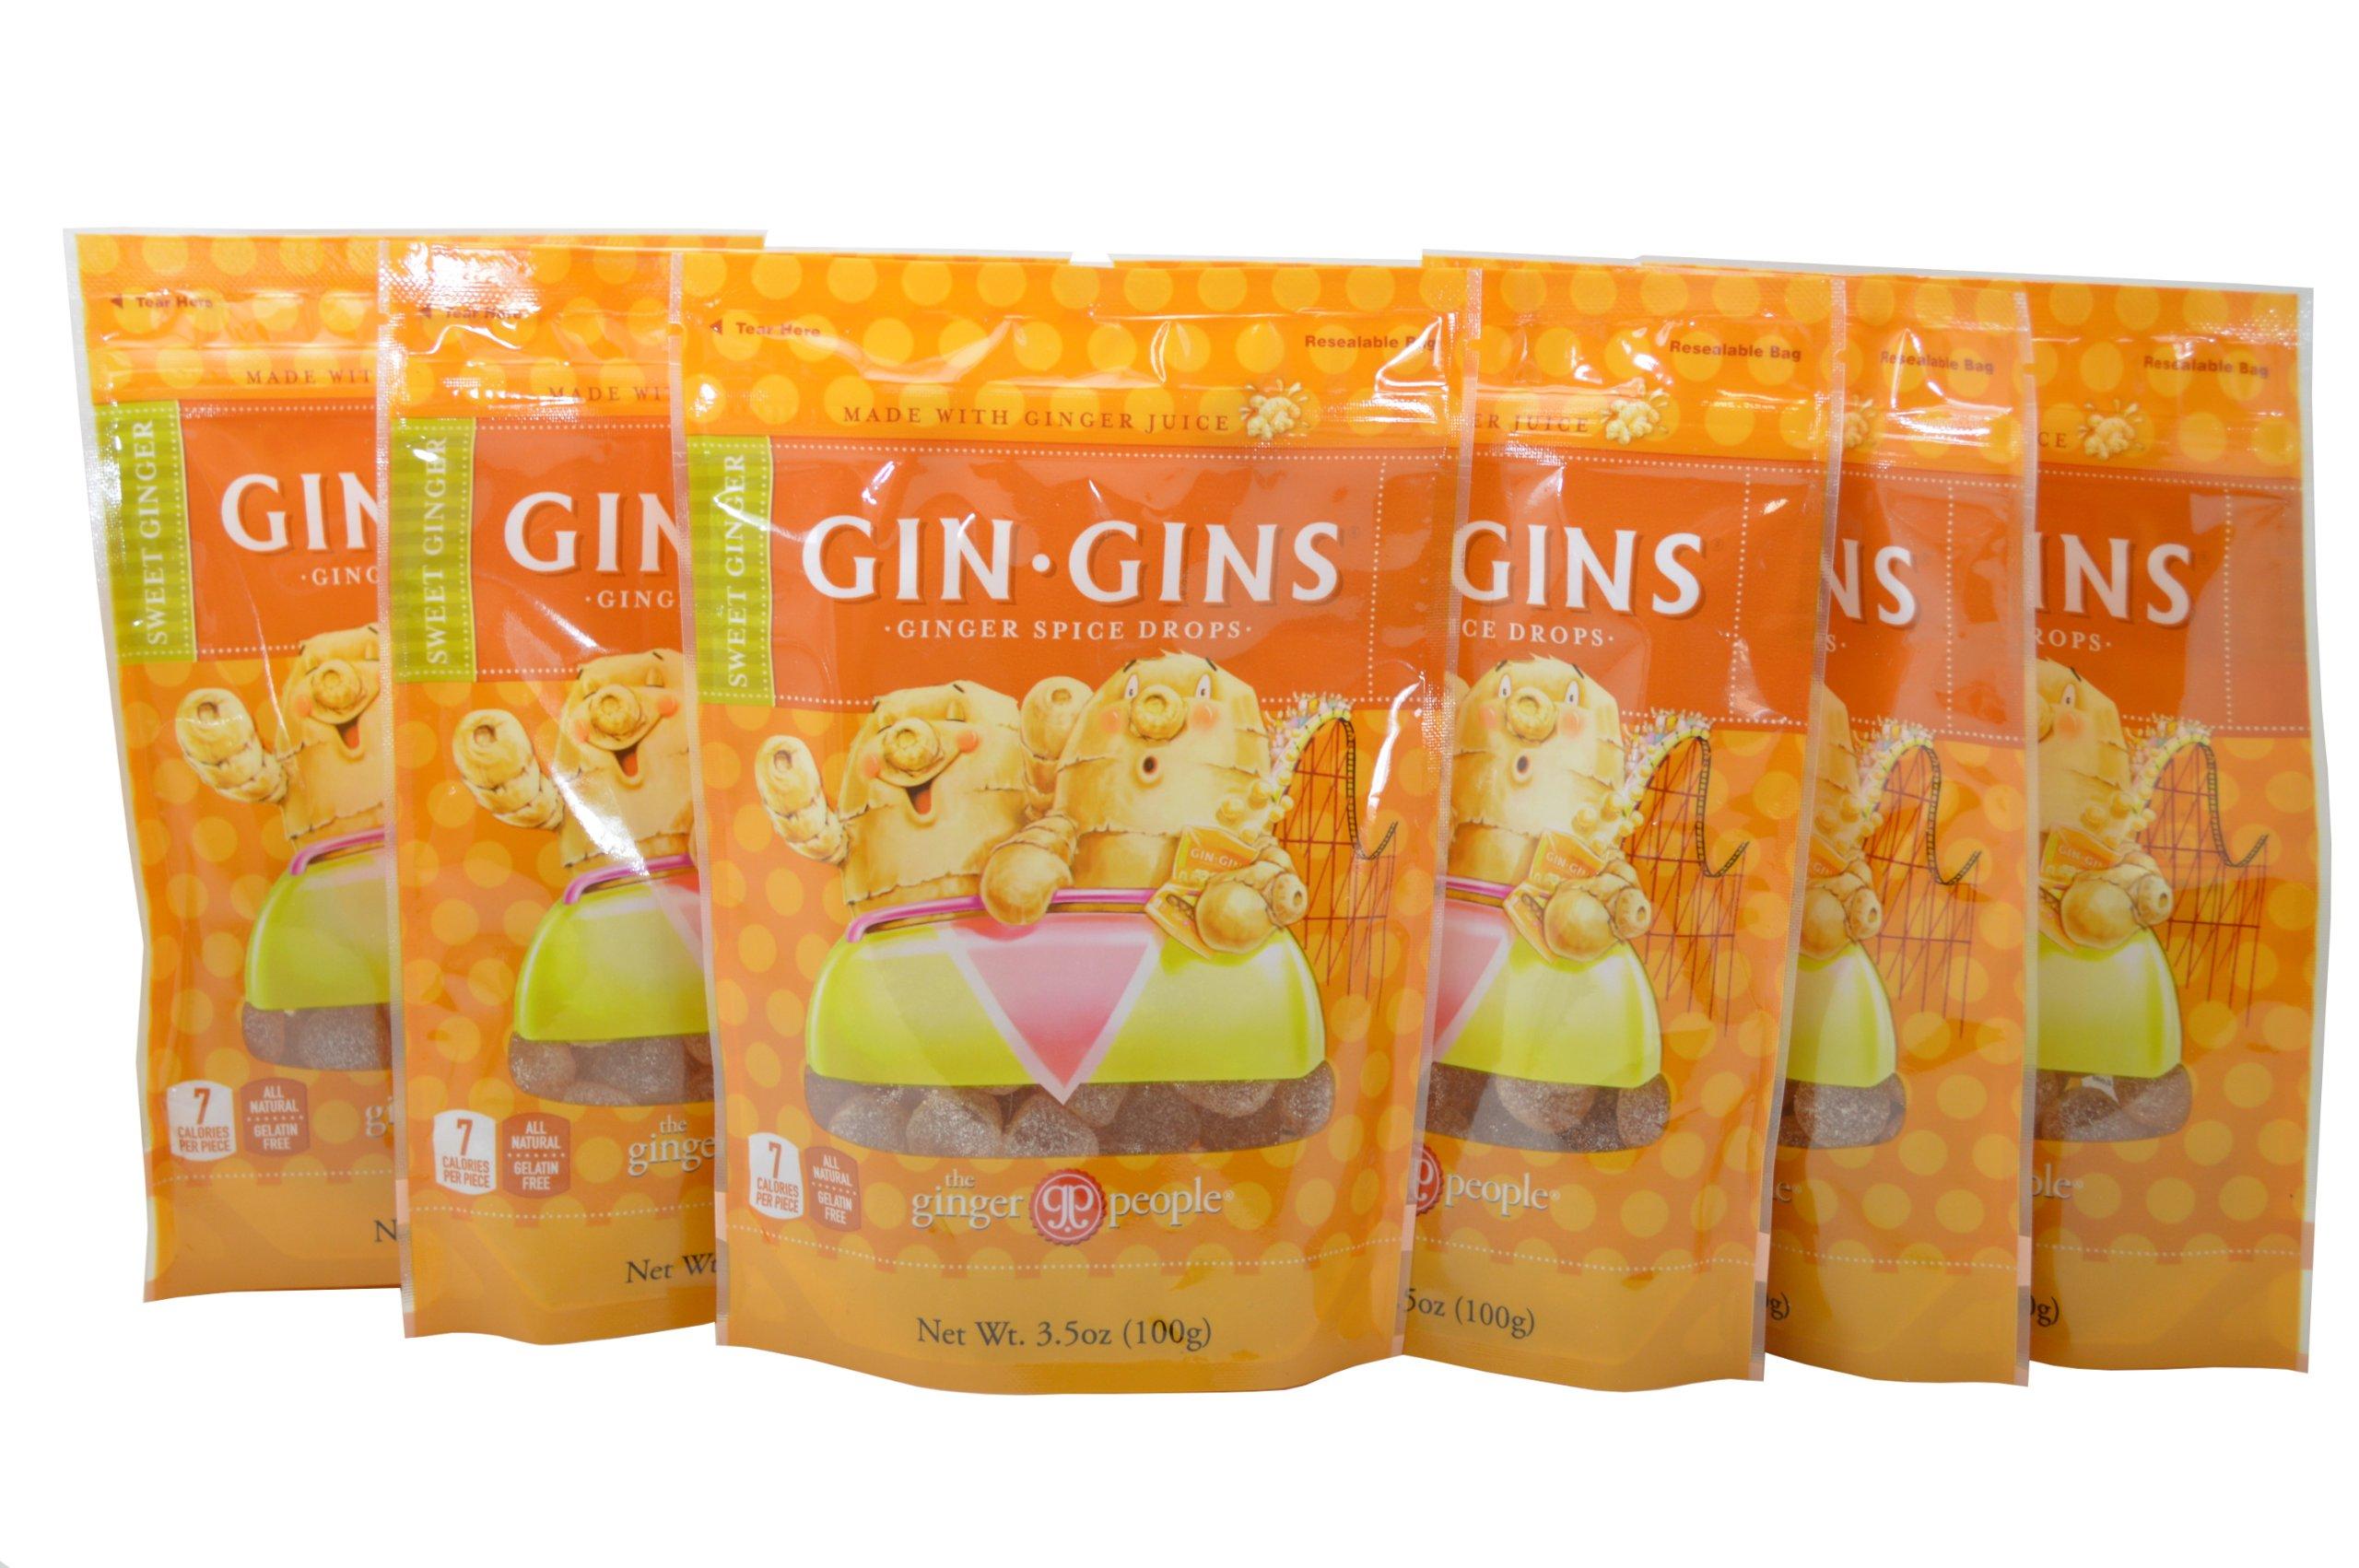 Gin-Gins Ginger Spice Drops 3.5 Oz Bag Sweet Ginger (Pack of 6)